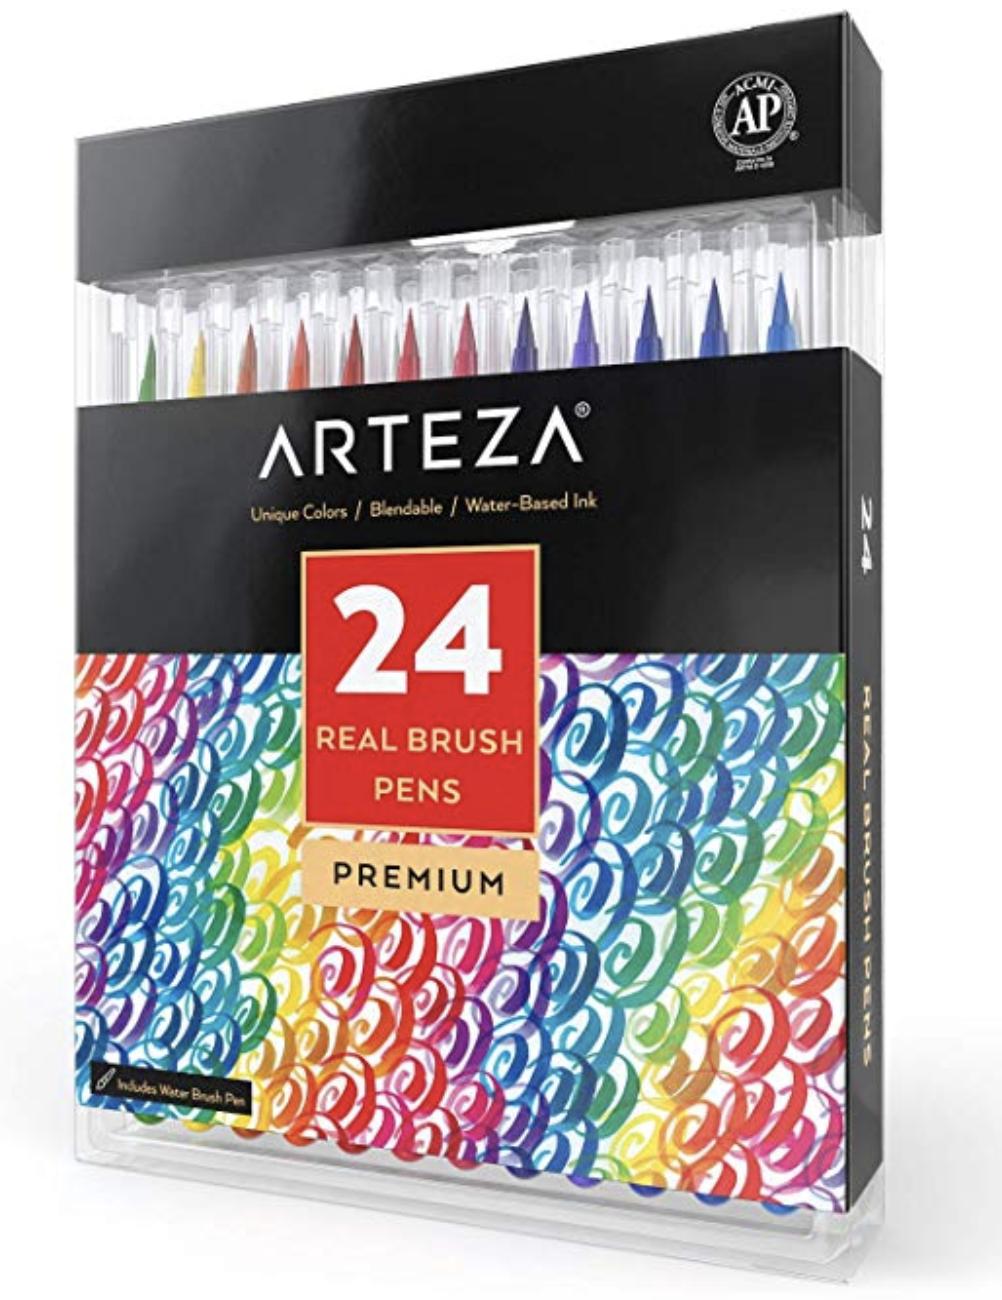 Arteza Brush Pens • Water based ink 24-Pack